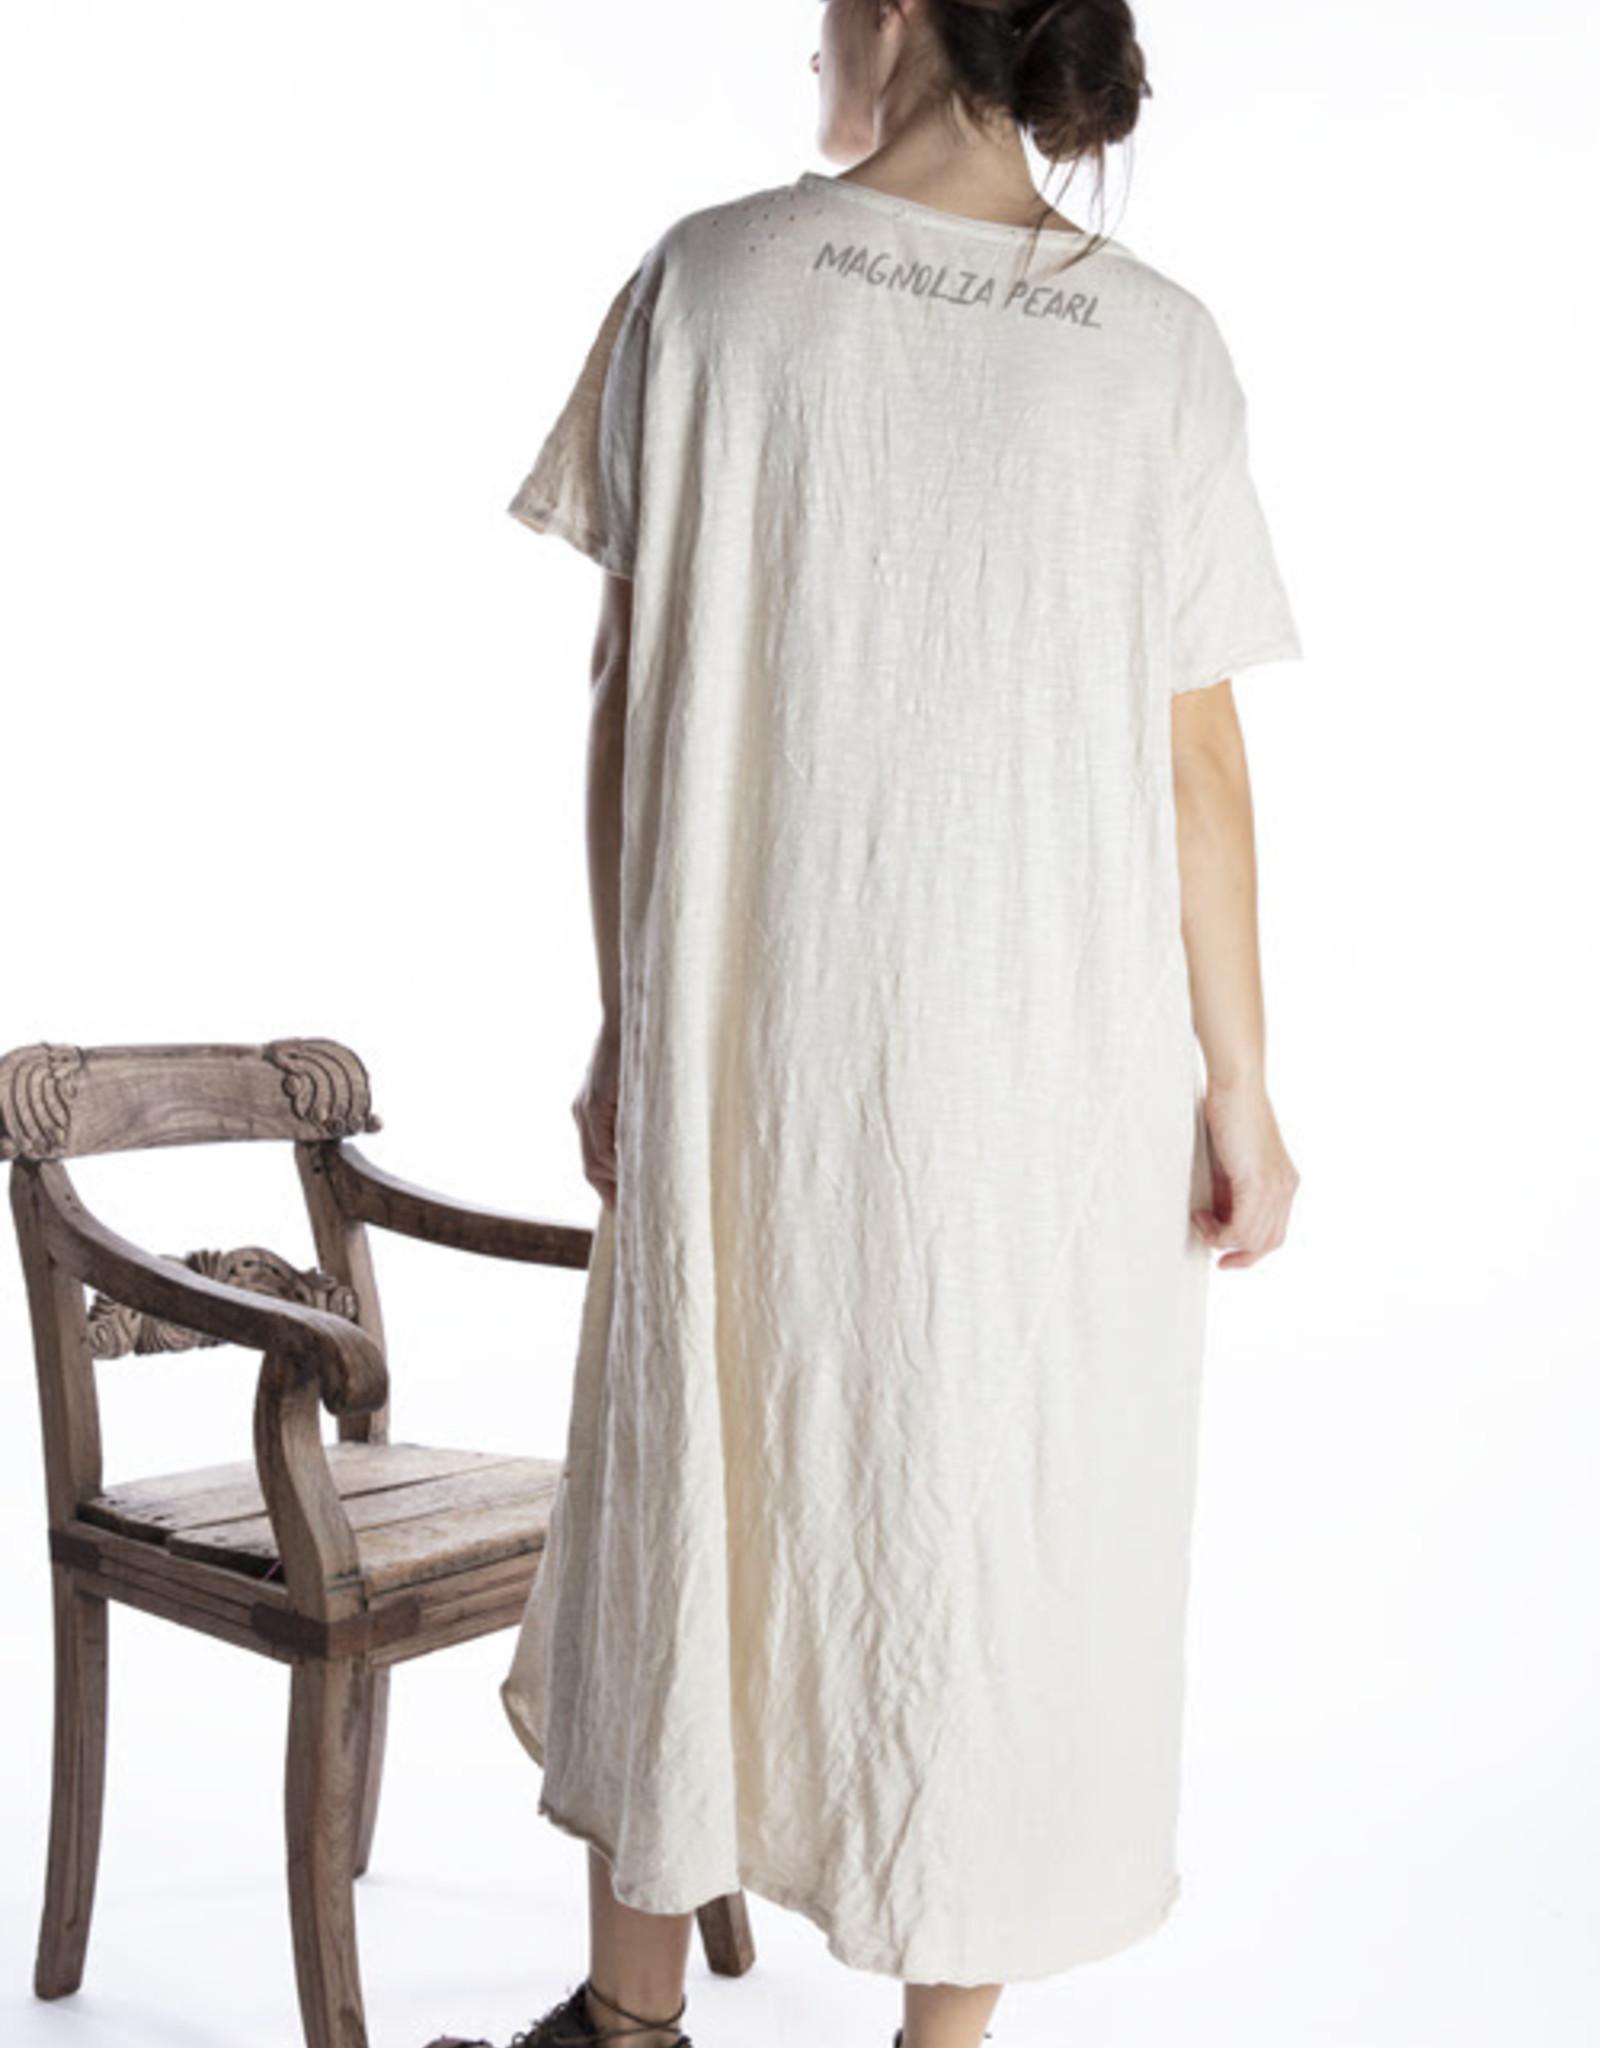 MAGNOLIA PEARL MAGNOLIA PEARL DRESS 703